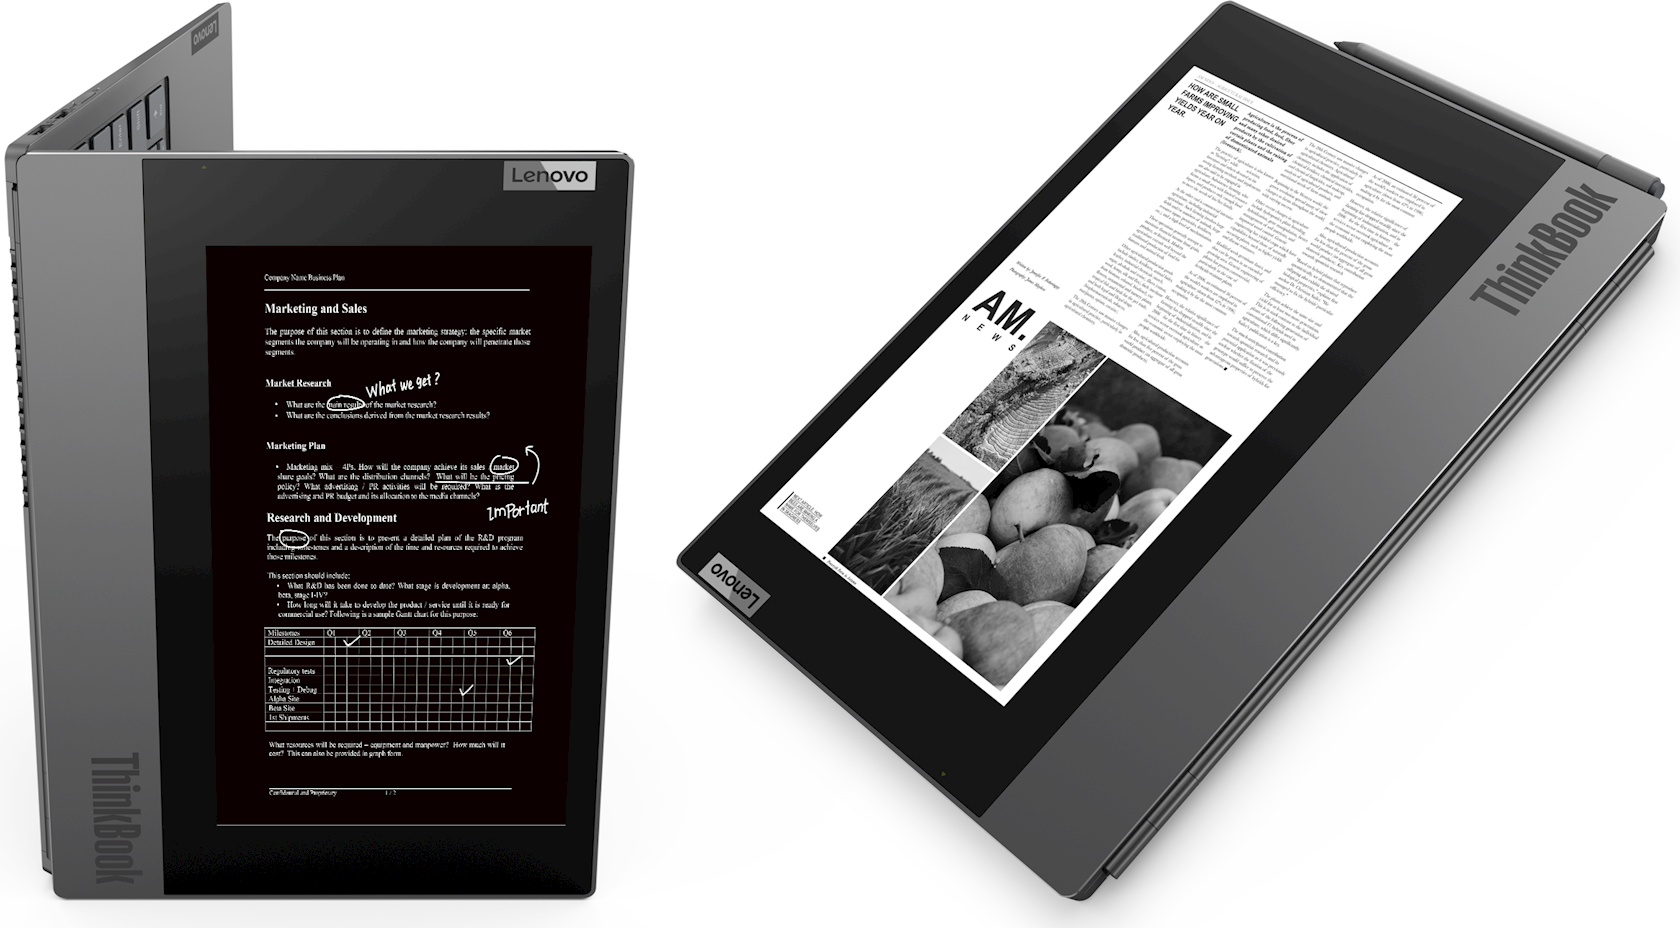 Noutbuk Lenovo ThinkBook PLUS/ Dual Screen